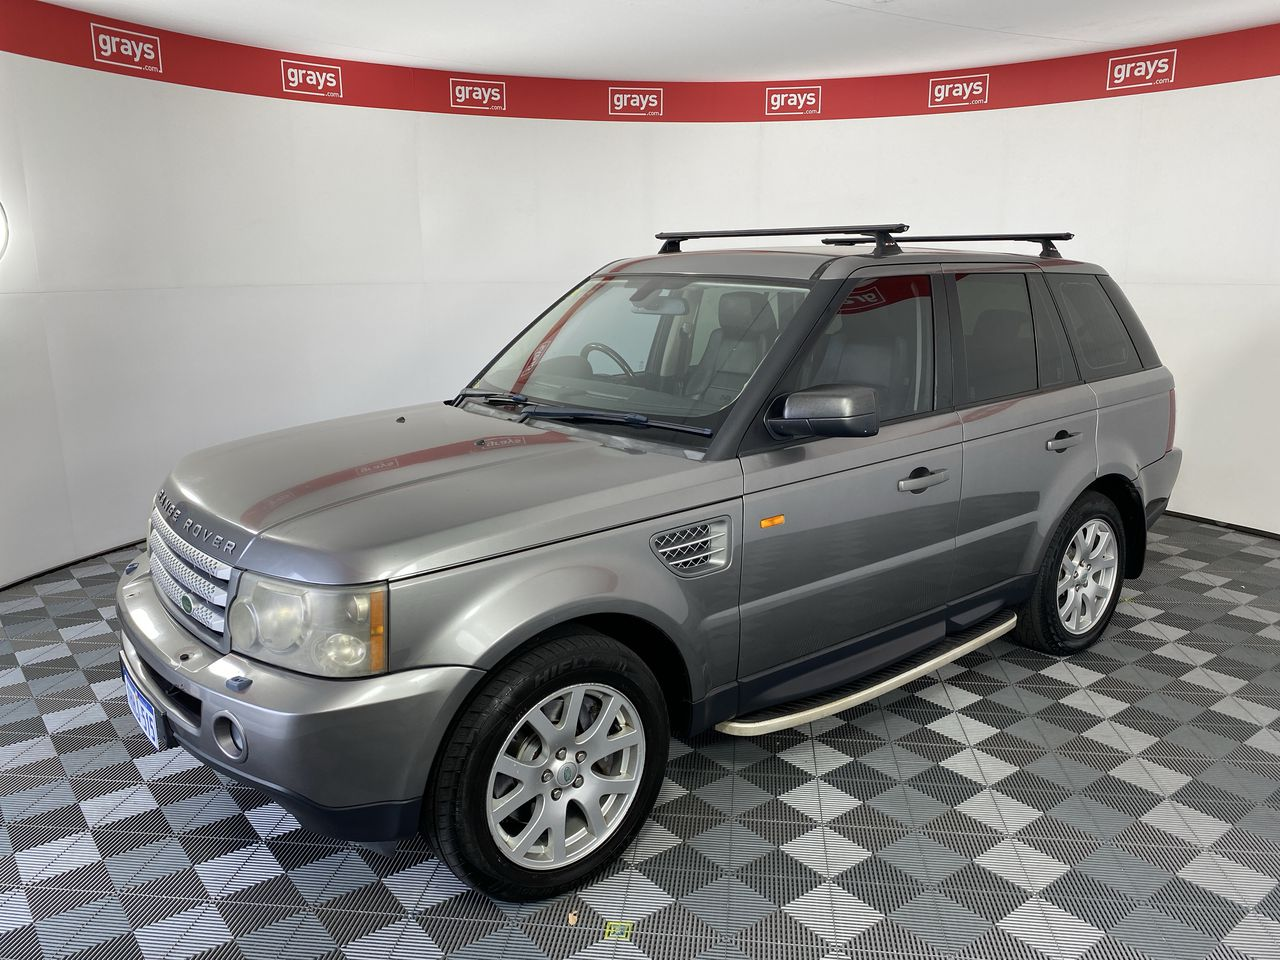 2007 Land Rover Range Rover Sport TDV8 Turbo Diesel Automatic Wagon